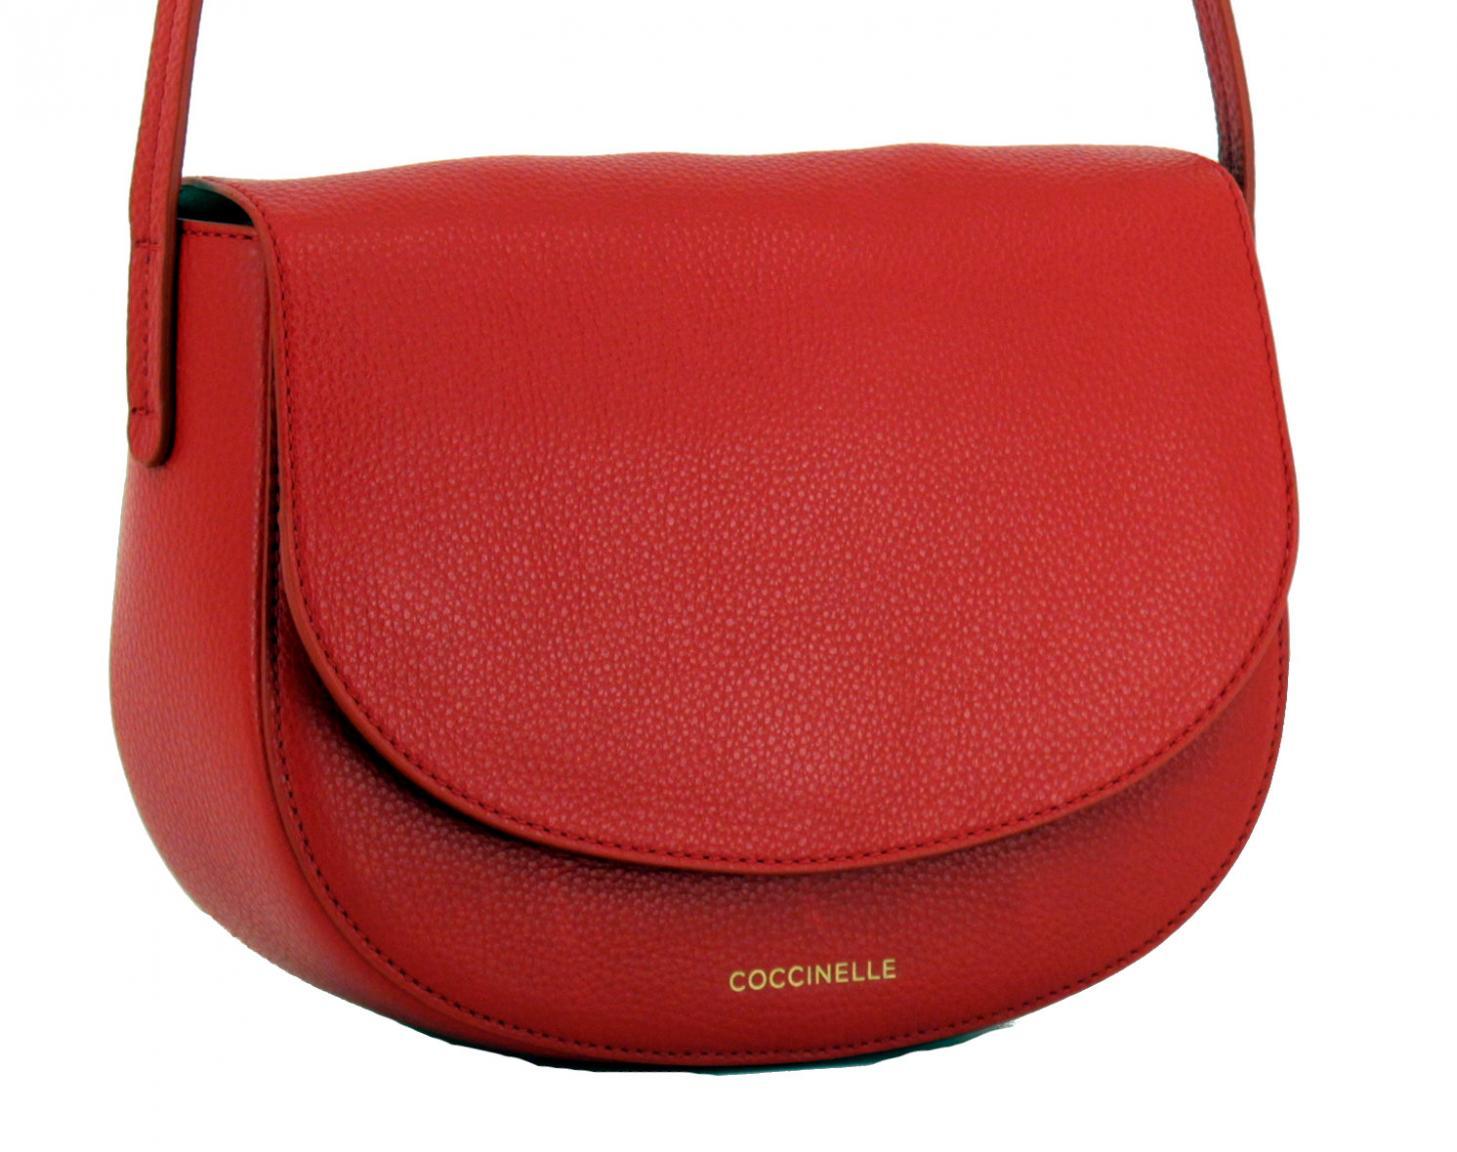 7286f2c4167e4 Coccinelle Umhängetasche Dione rot Überschlag Coquelicot - Bags   more